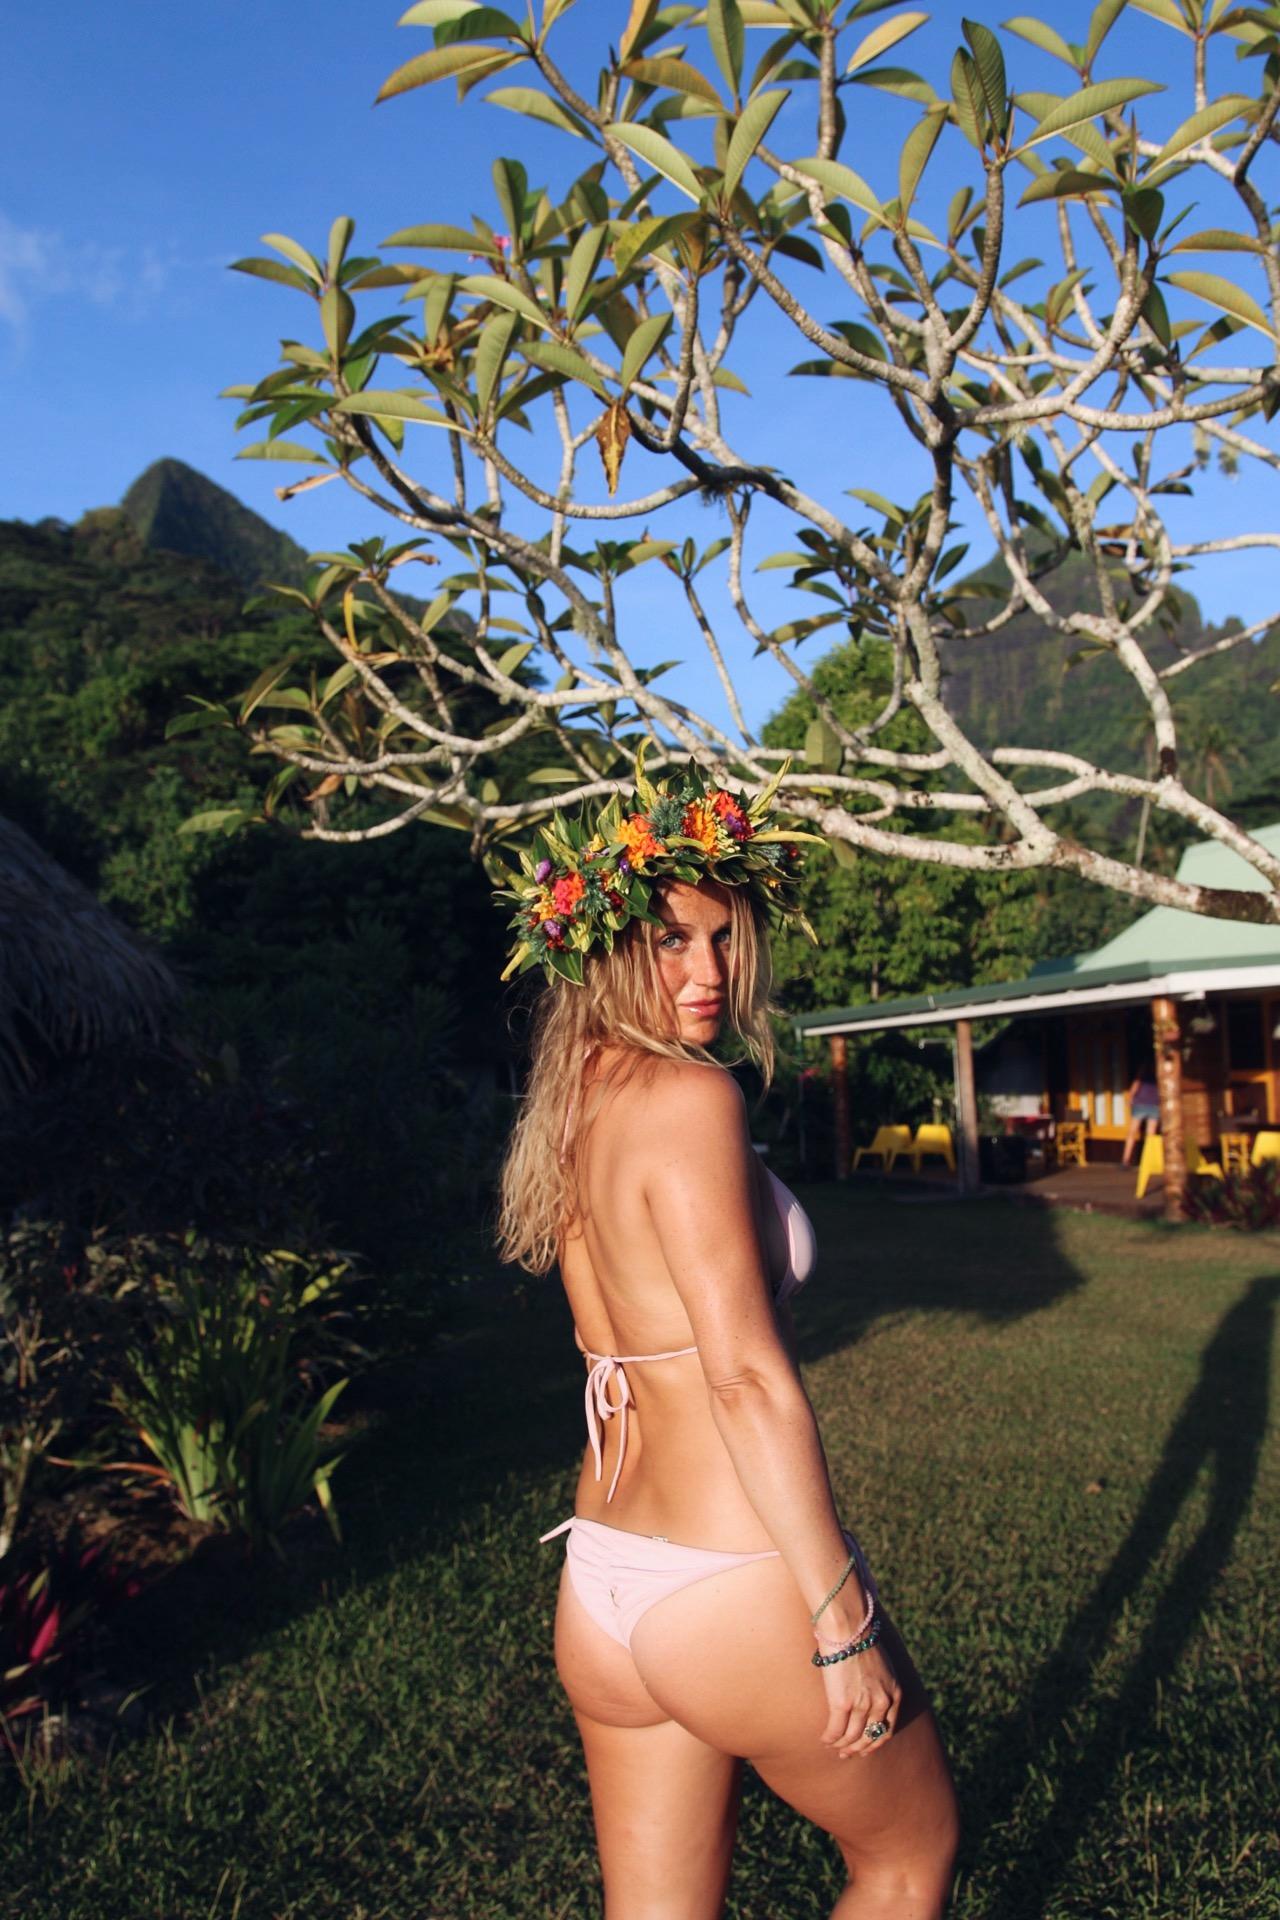 Island girl 4ever